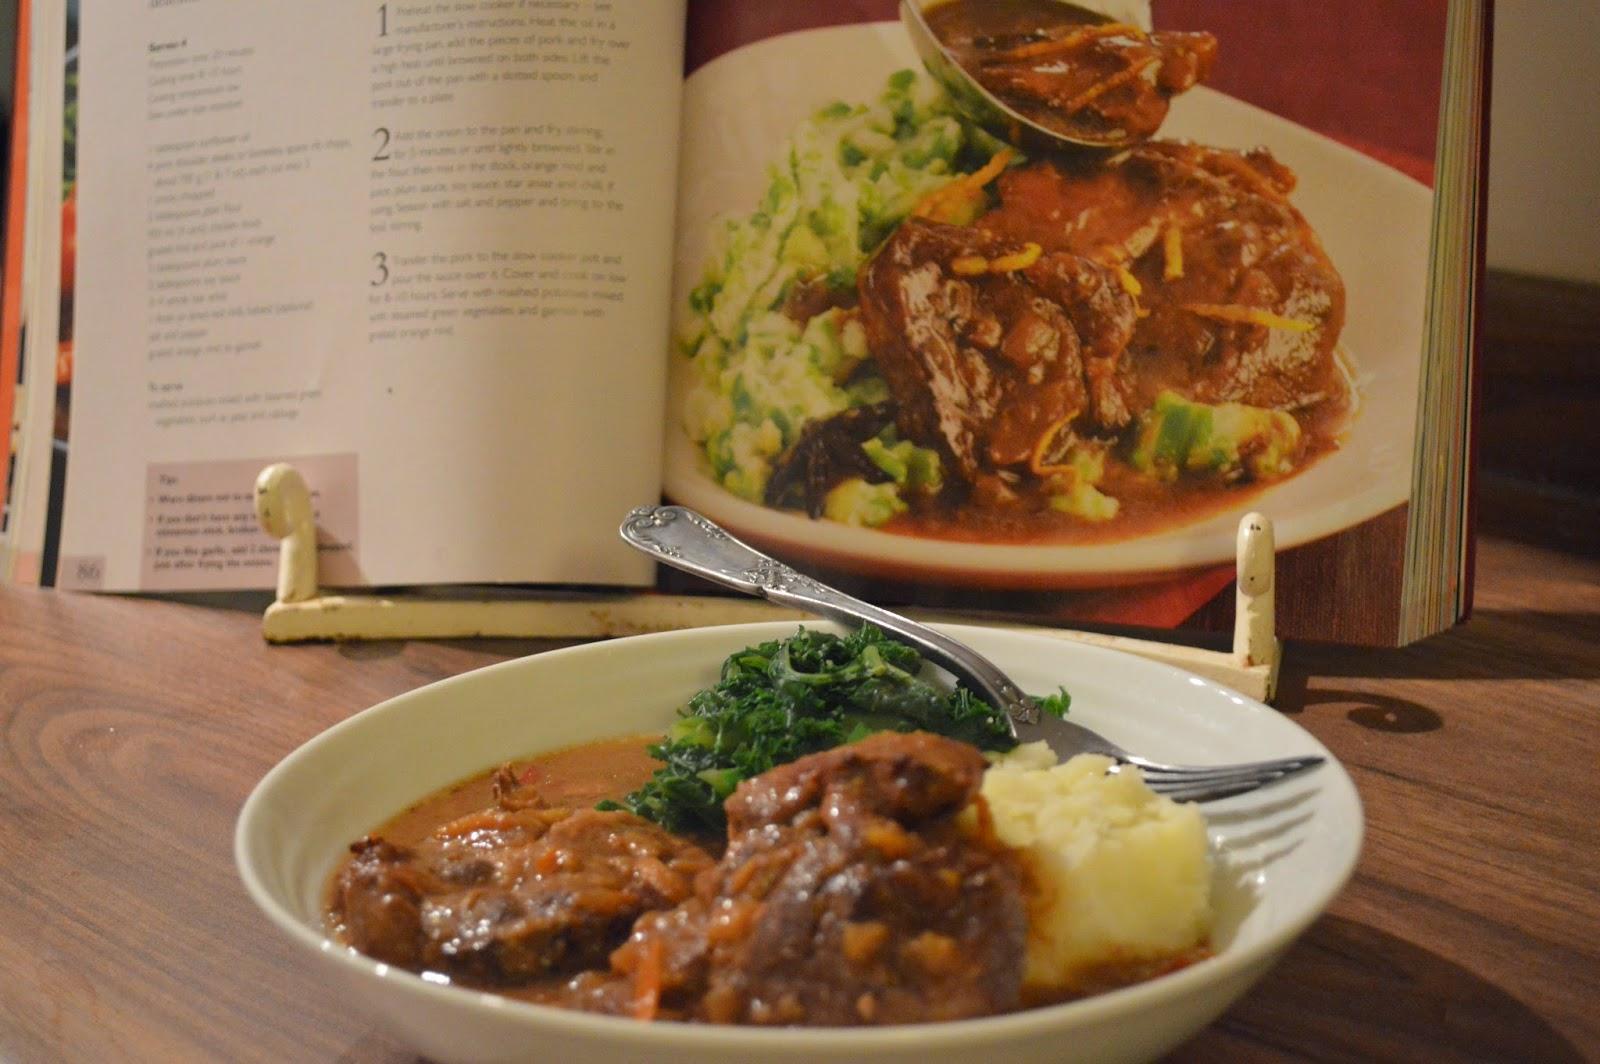 Slow Cooker recipes, gingey bites, pork stew